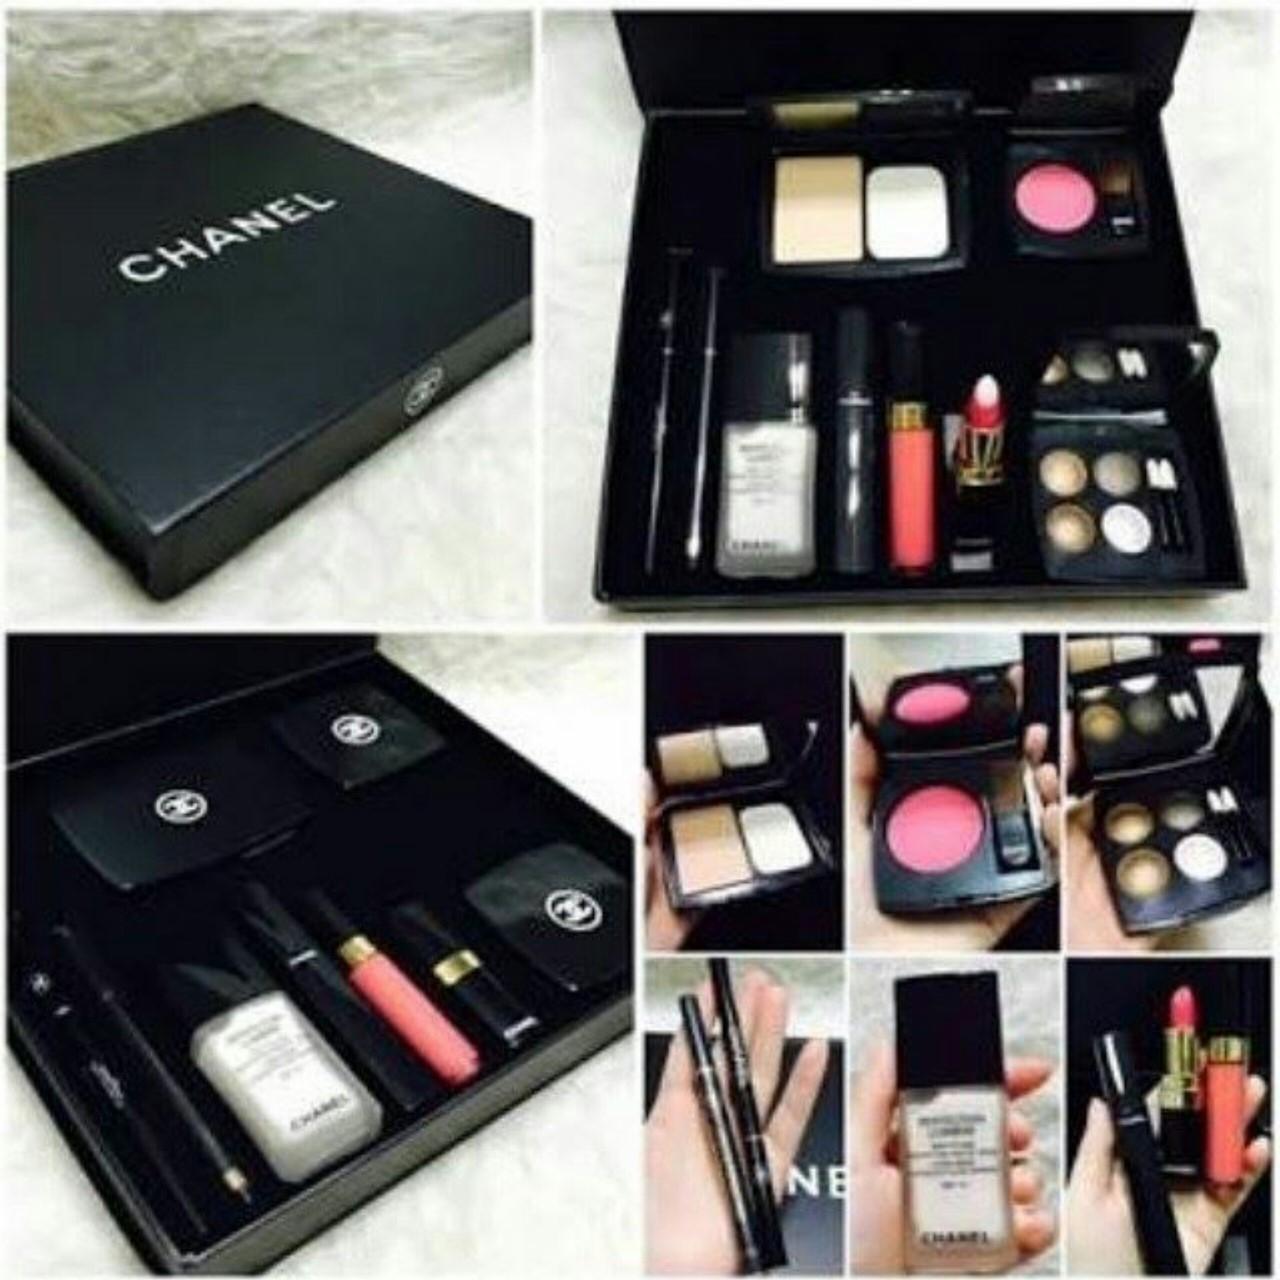 Chanel Beauty Gift Sets Uk The Art Of Mike Mignola